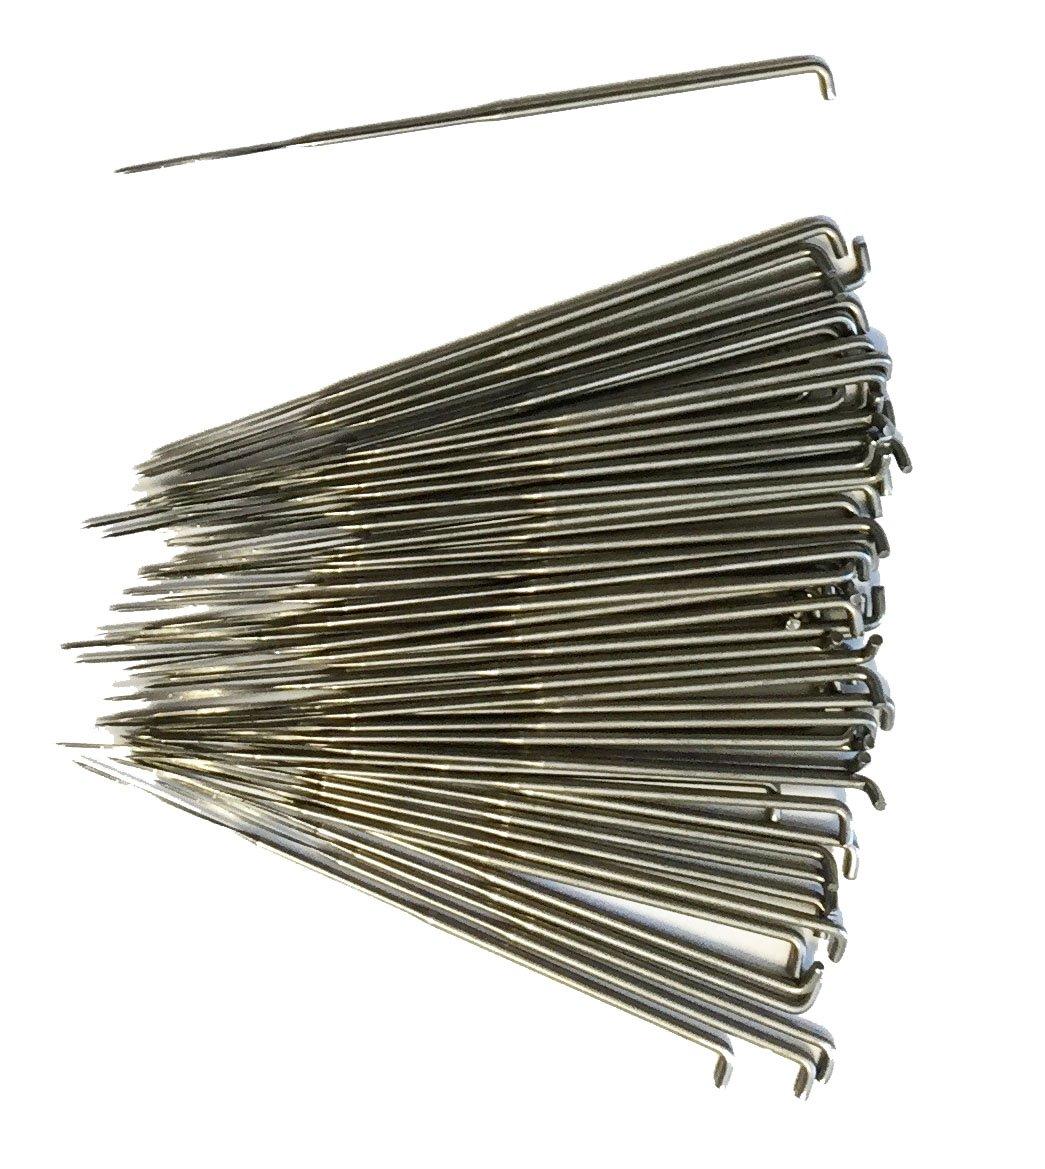 Weir Crafts Size 36 Felting Needles- bulk pack of 50 4336935684